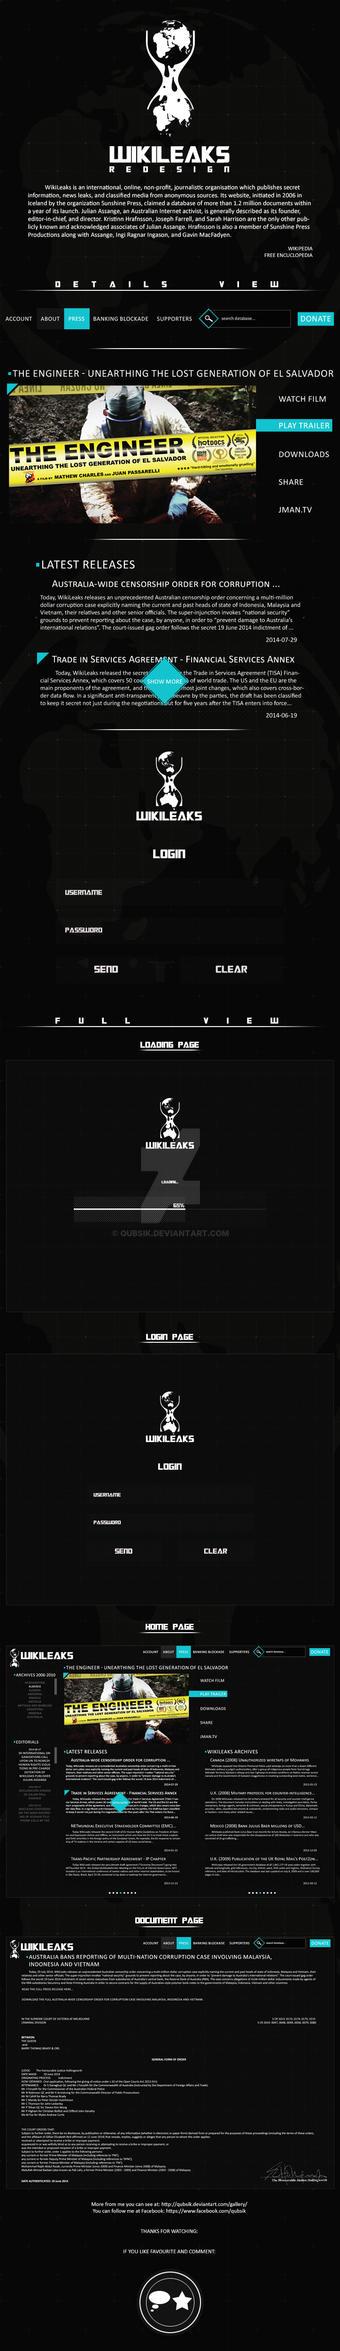 WikiLeaks Redesign by Qubsik